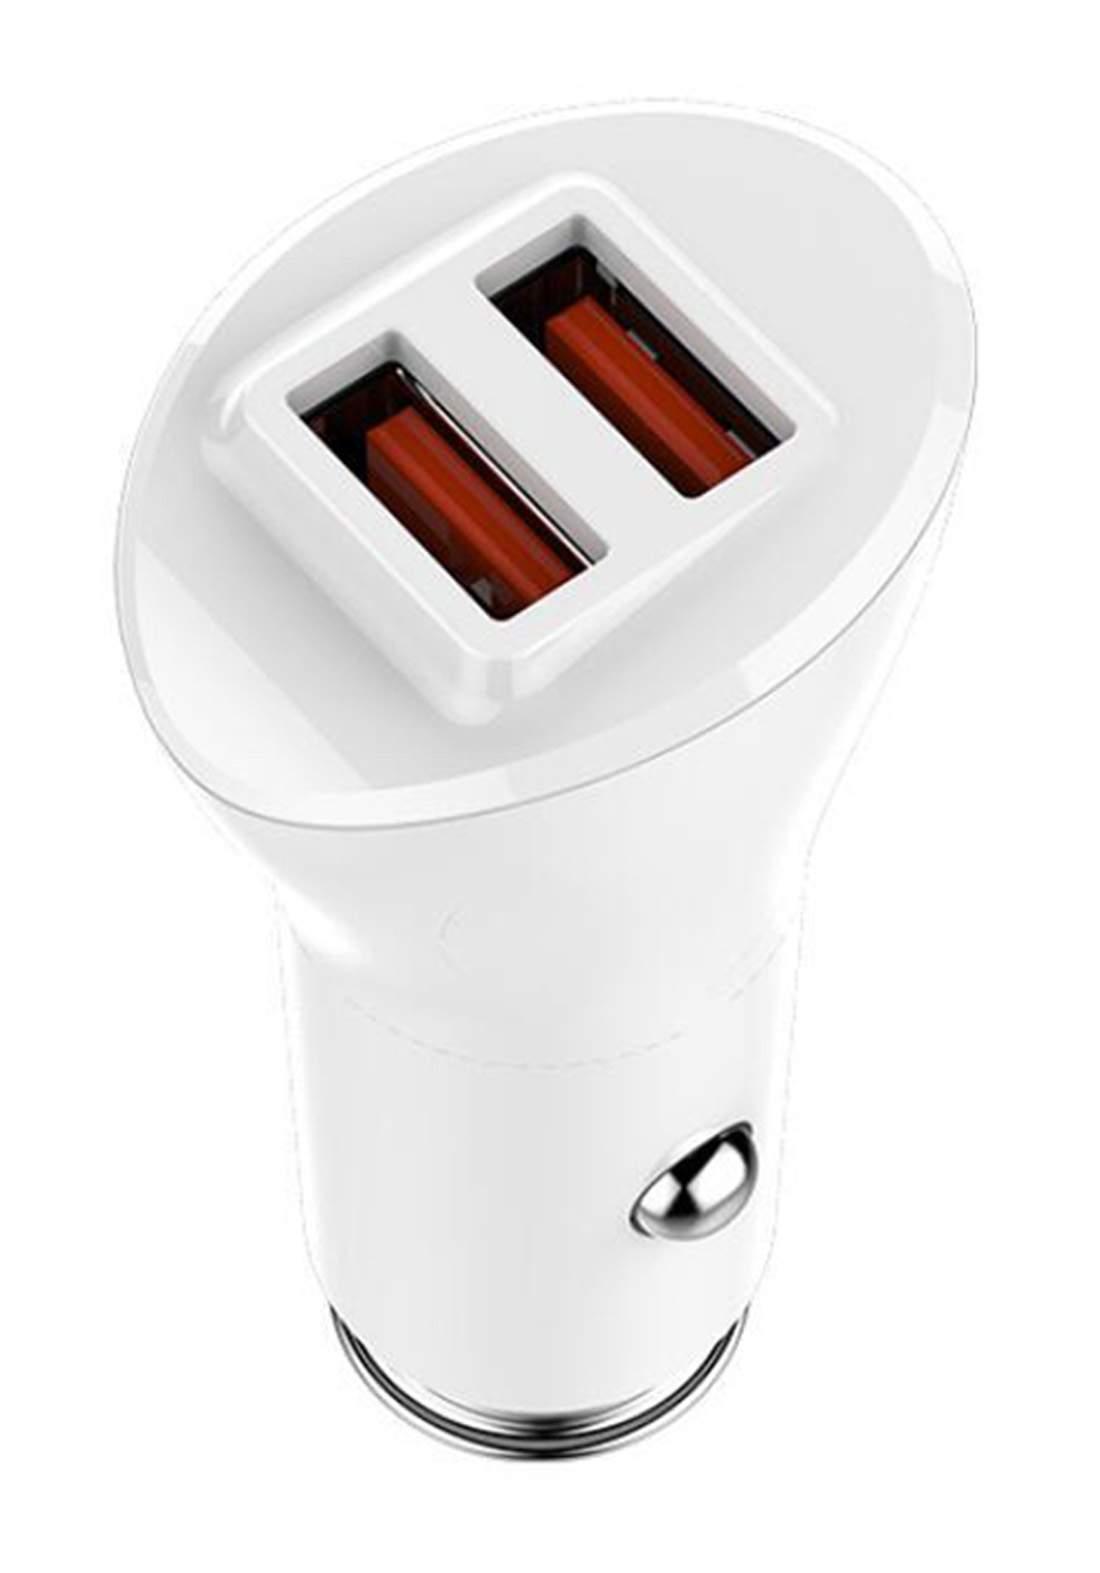 Ldnio  C511Q 36W USB 3.0 2port QC3.0 Car Charger- White